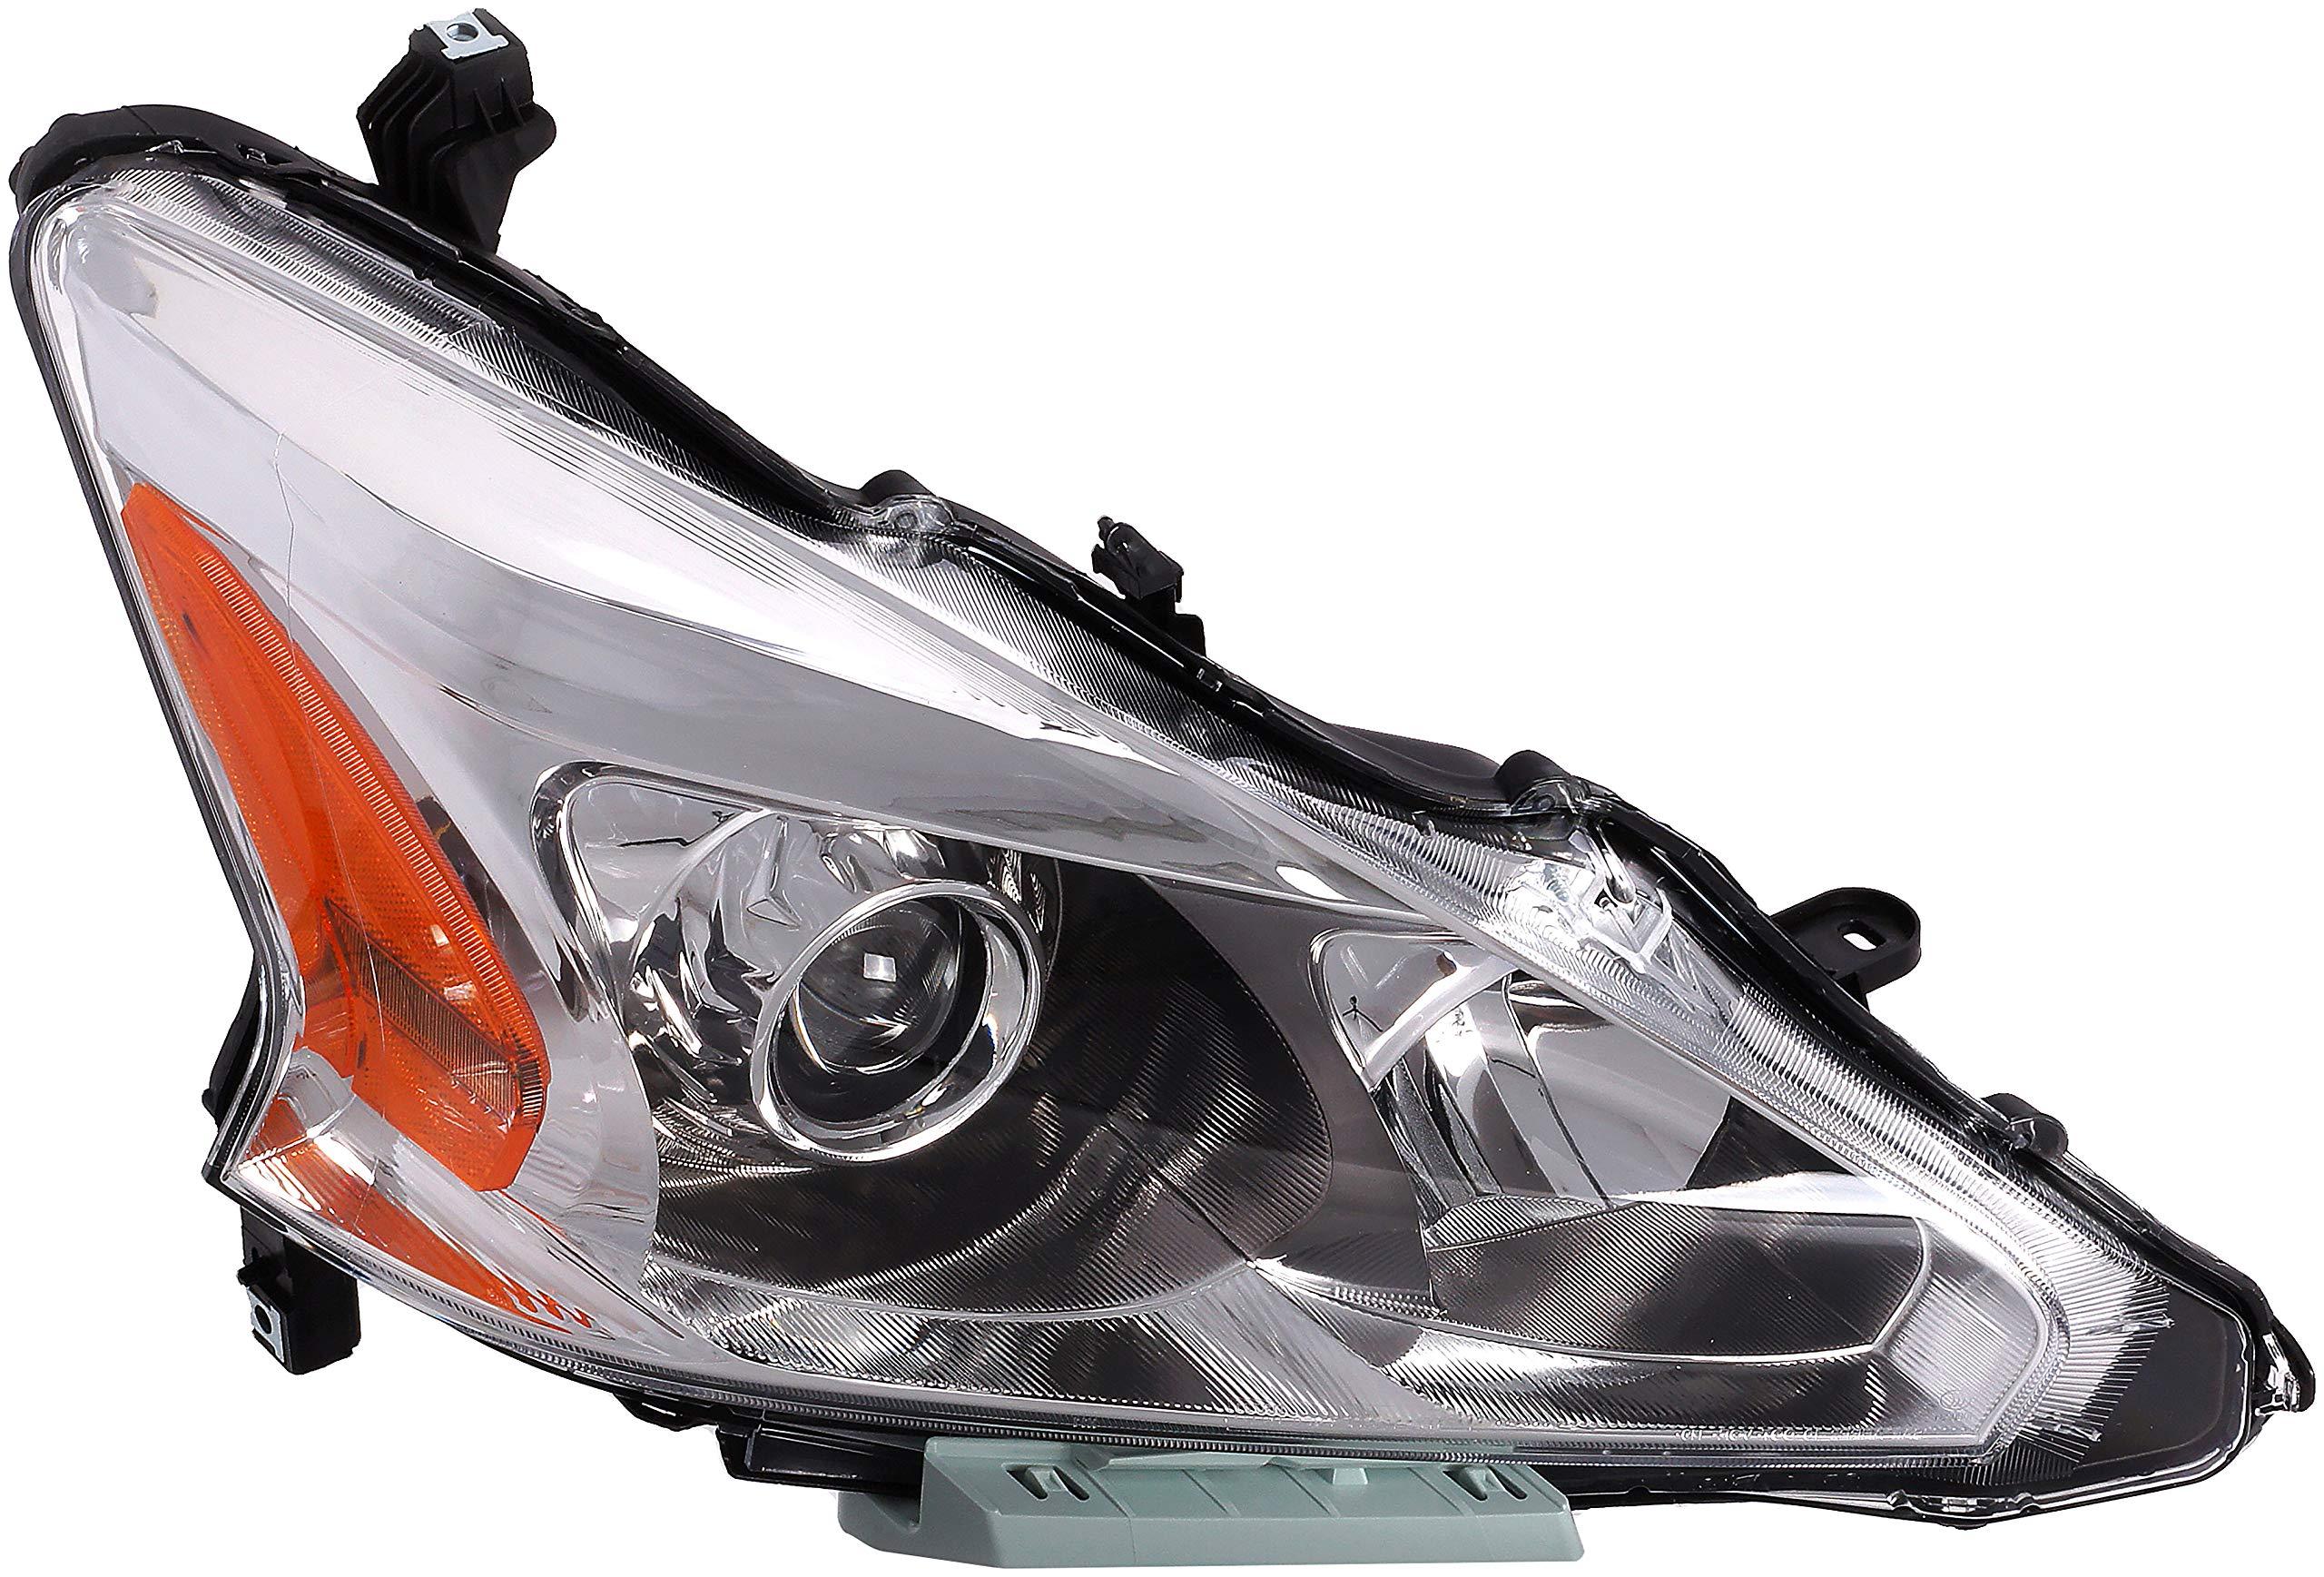 Dorman 1592502 Front Passenger Side Headlamp Assembly for Select Nissan Models by Dorman